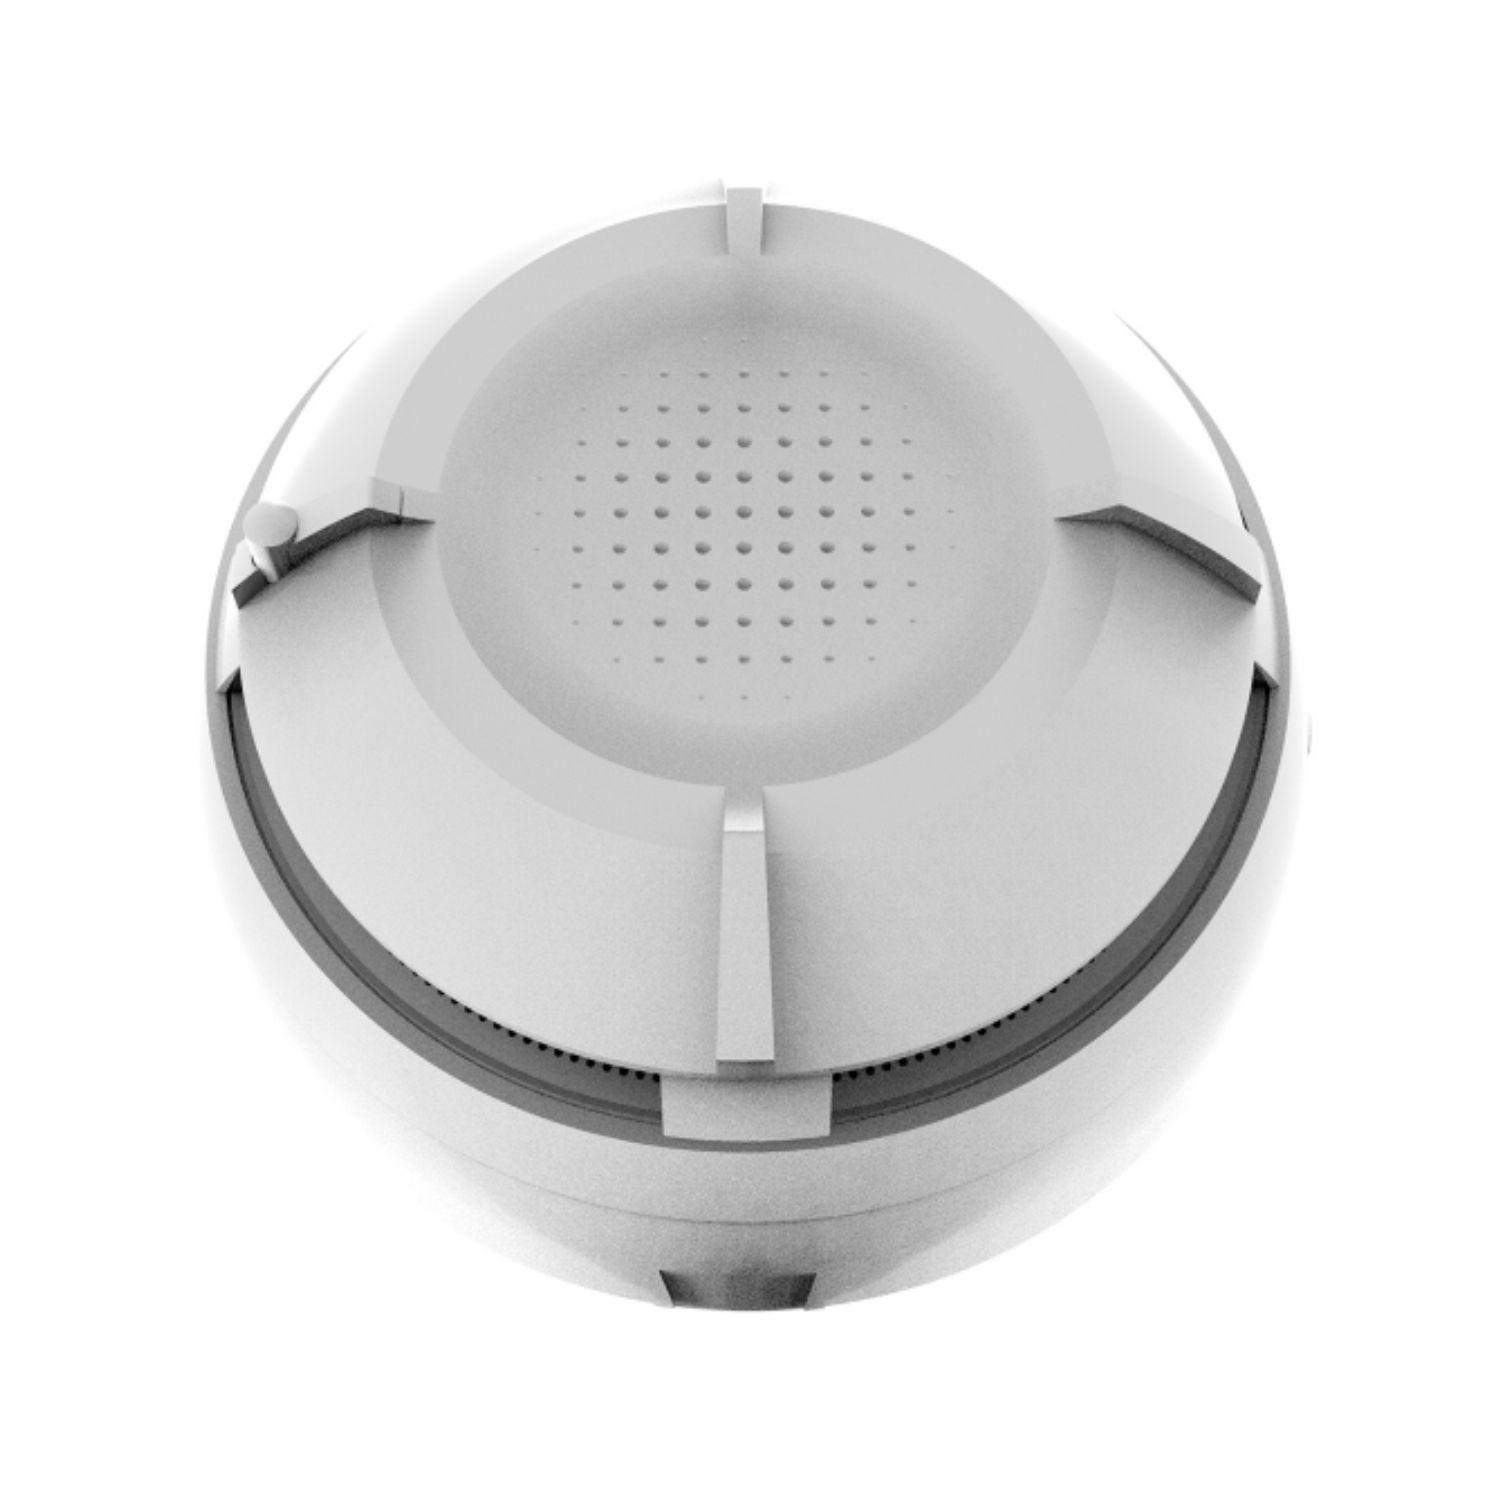 EKHO Hybrid Wireless Optical Smoke Sensor